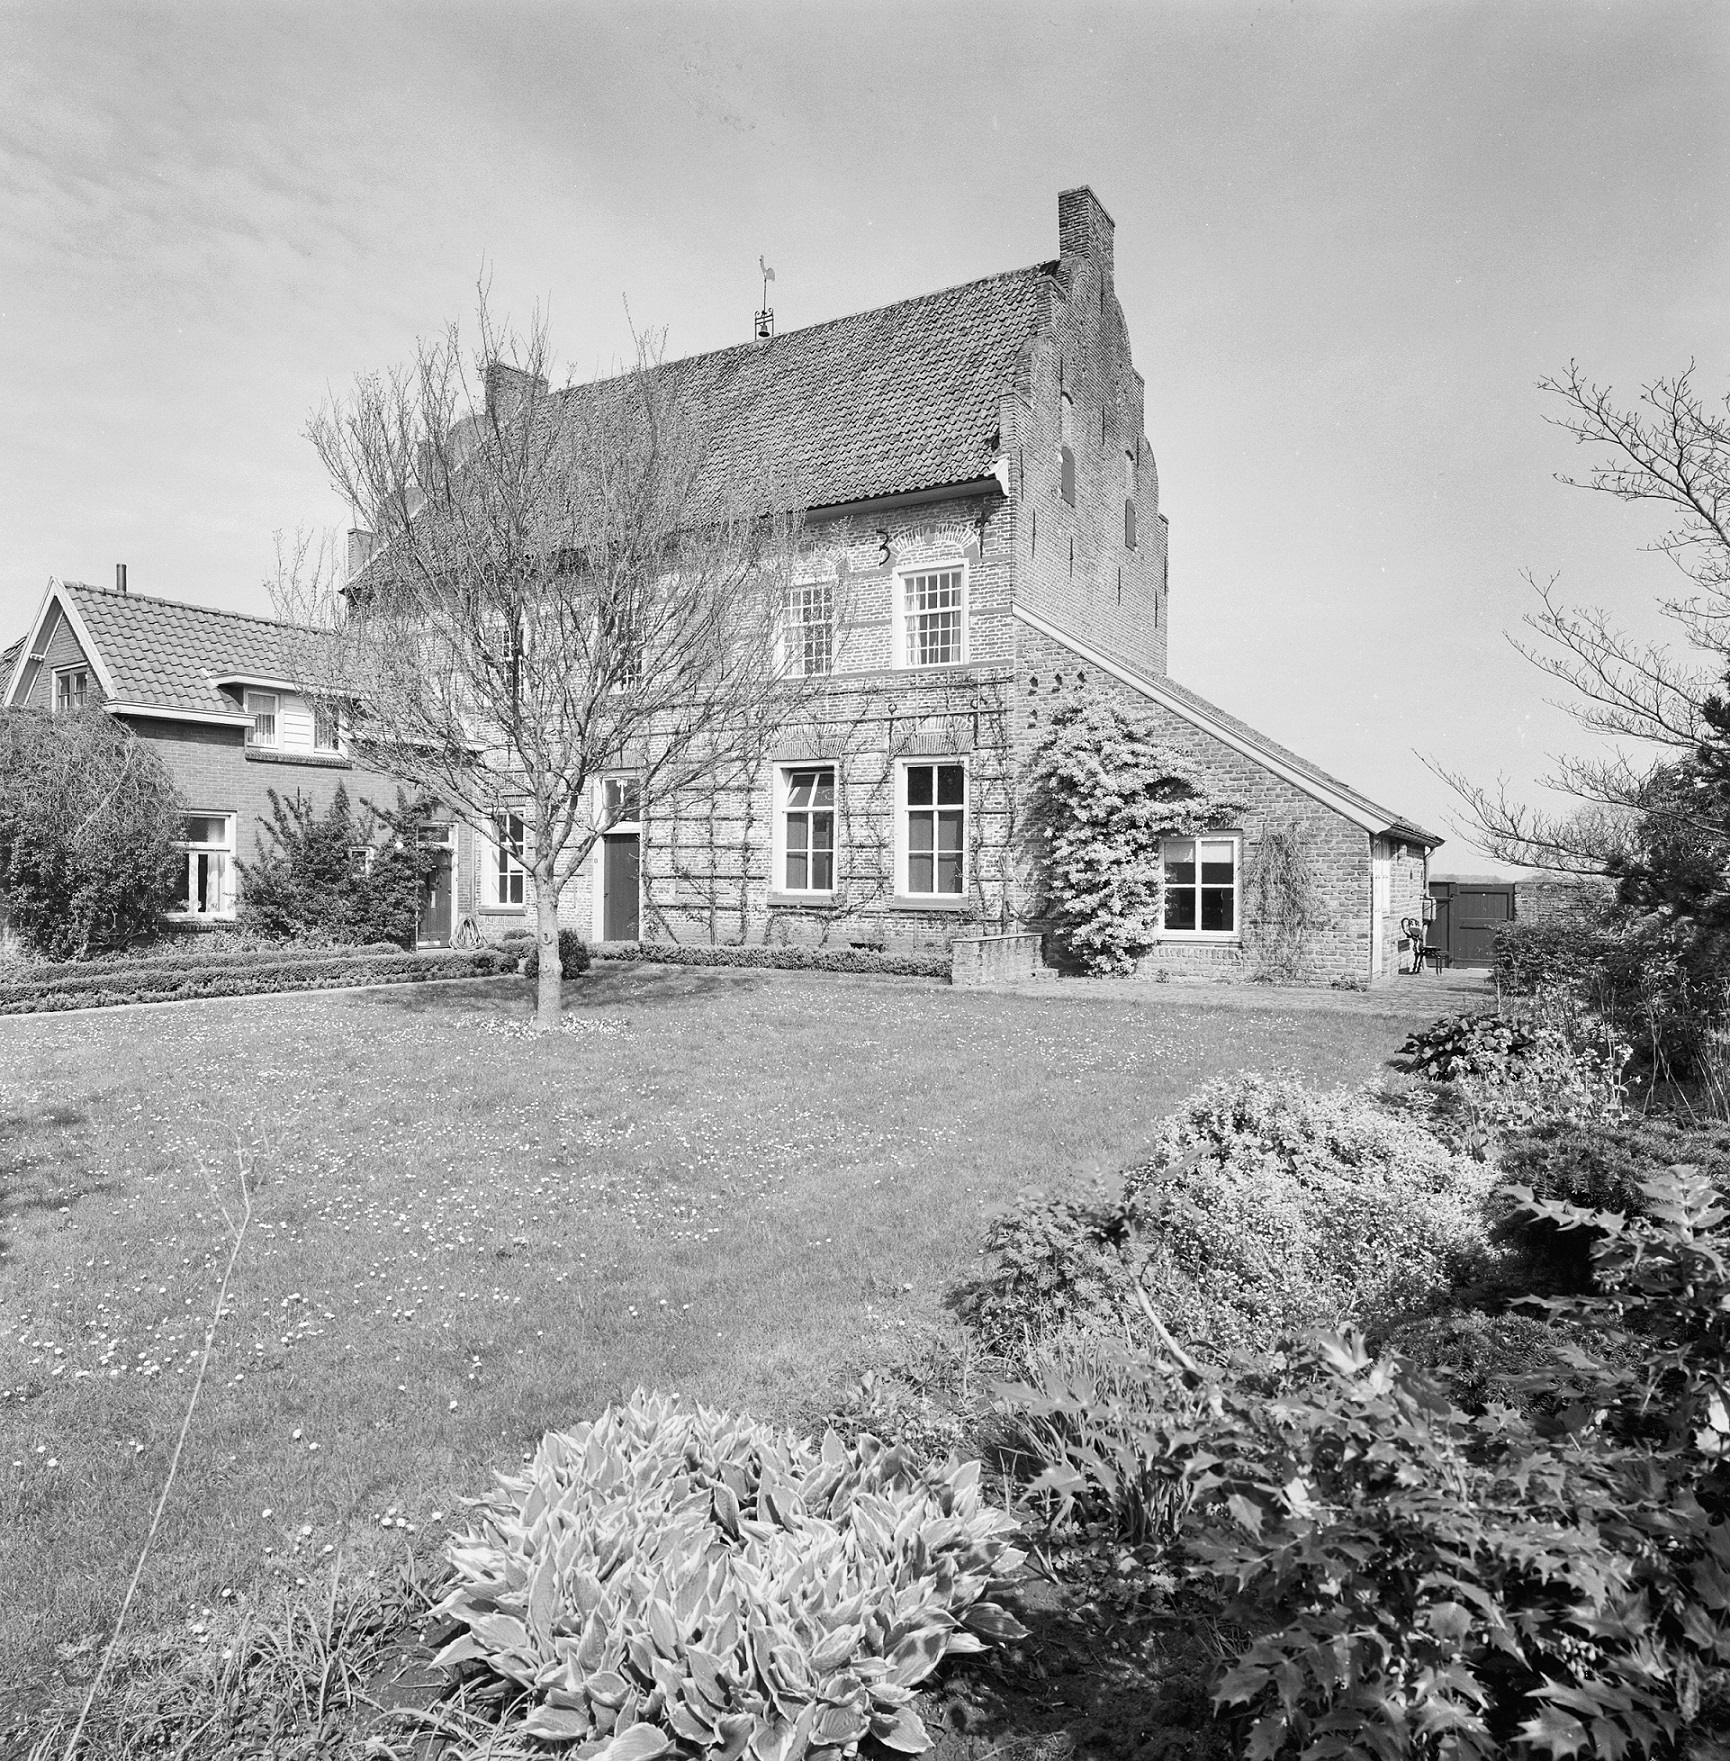 Bronkhorst Bovenstraat 12 Huis Ophemert of Het Hoge Huis